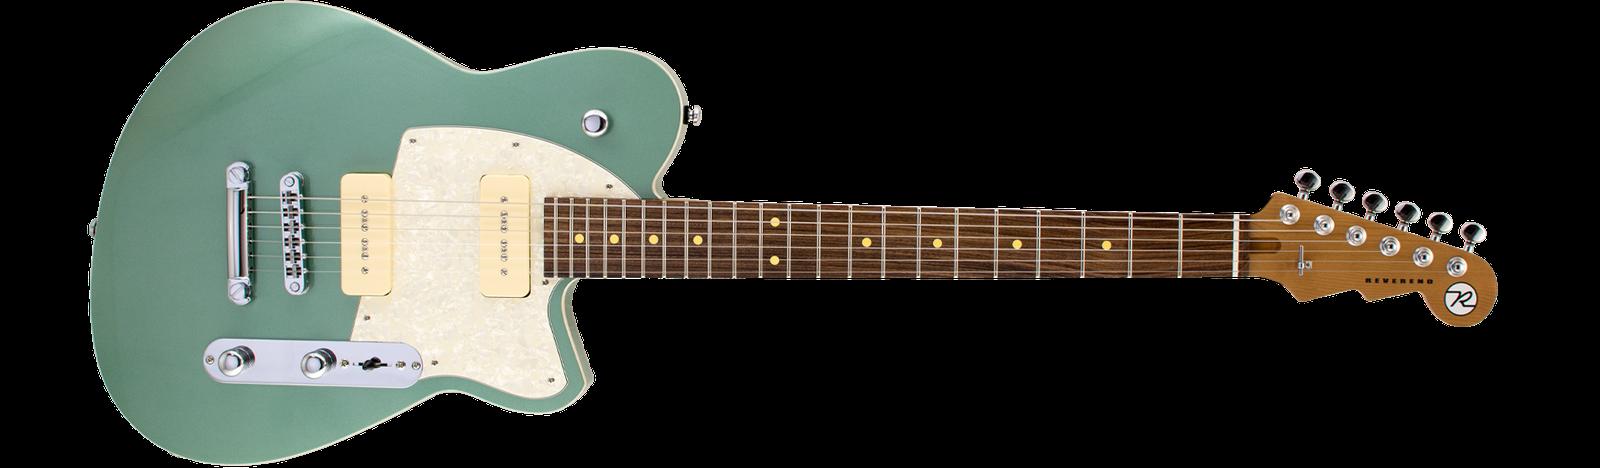 Reverend Guitars Charger 290 Metallic Alpine